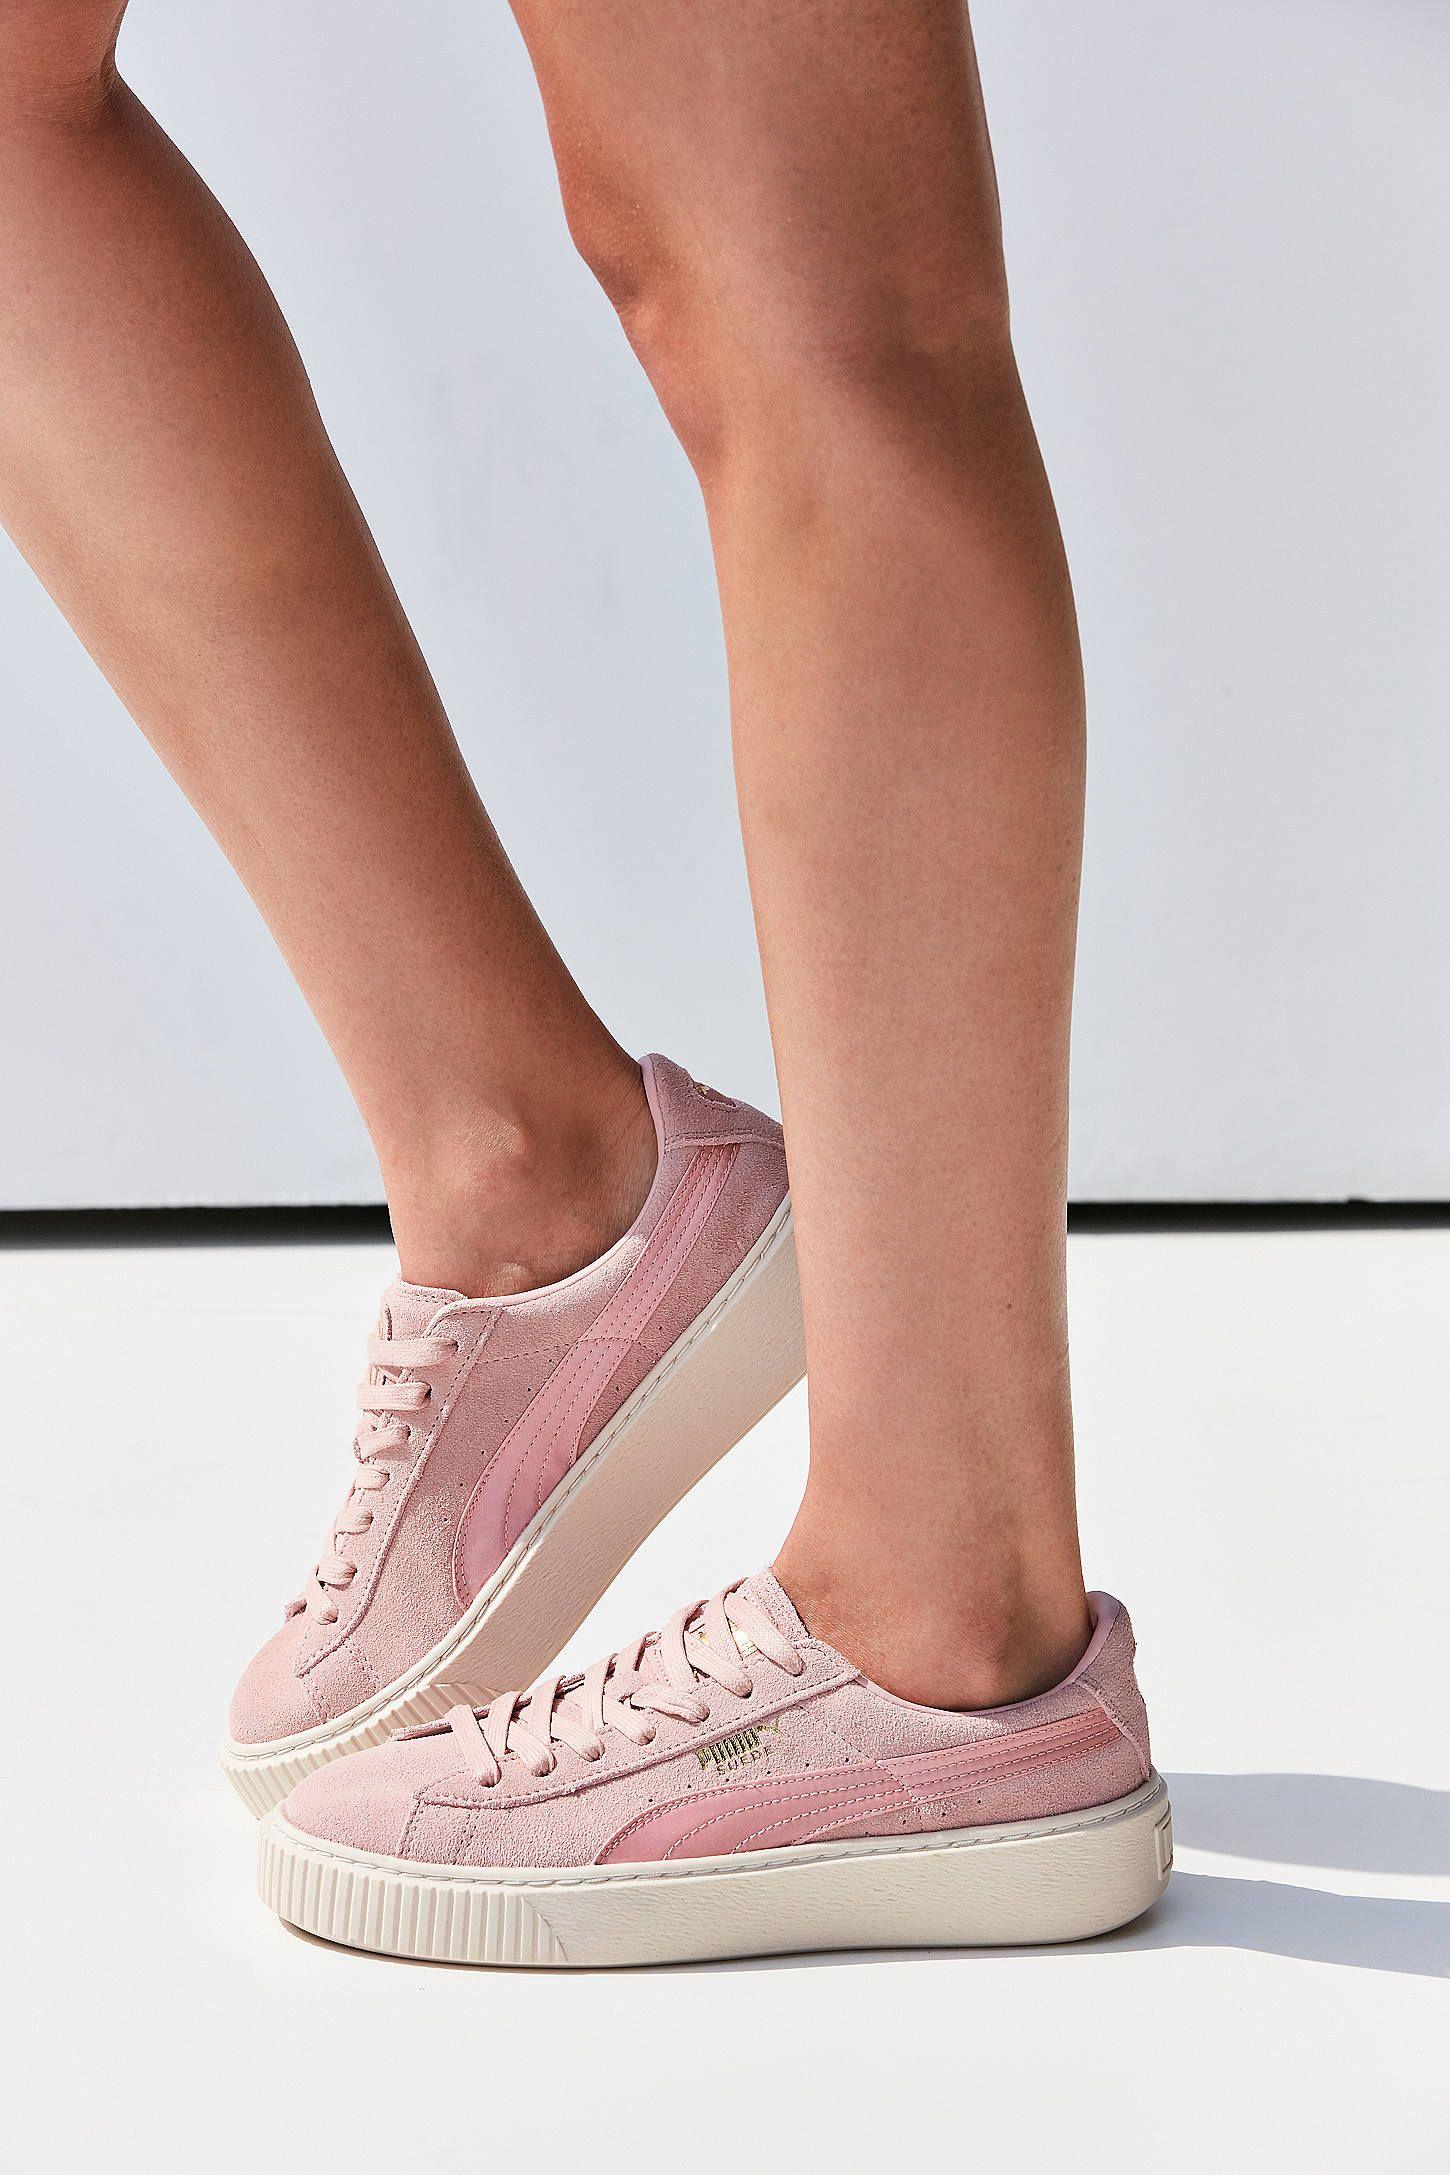 size 40 6bfd9 50507 Slide View: 5: Puma Suede Summer Satin Platform Sneaker ...